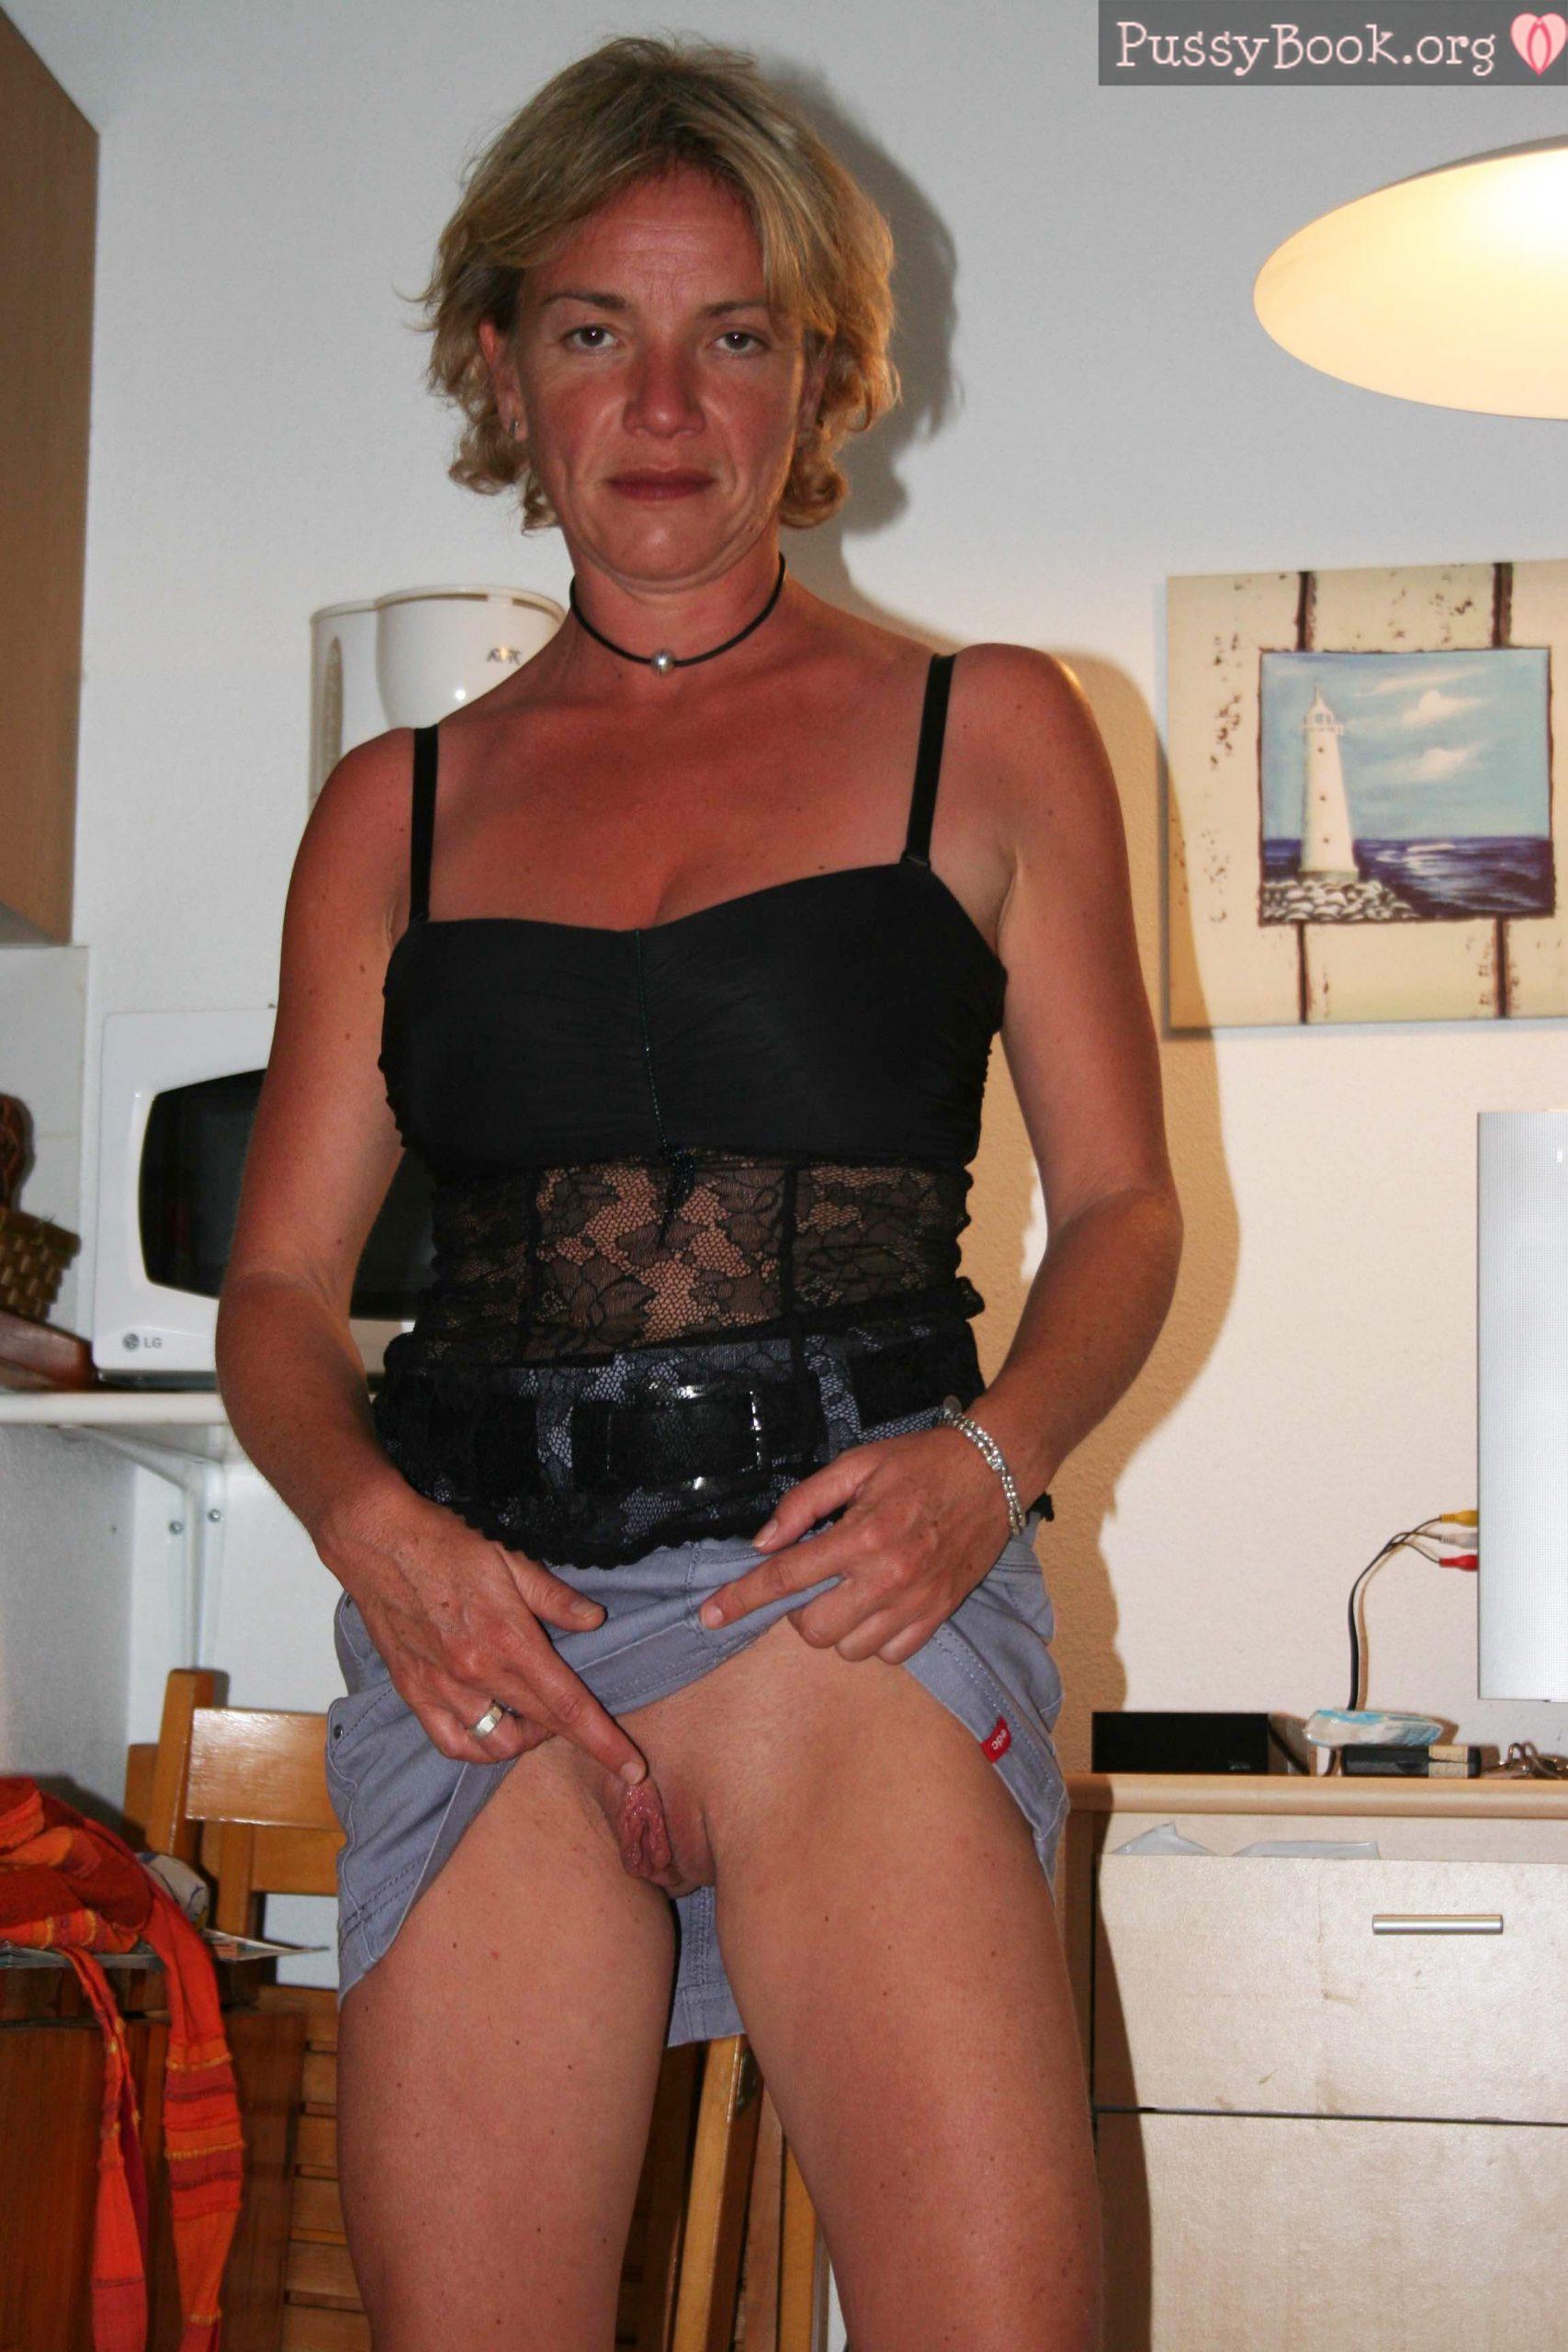 Slut wife photos